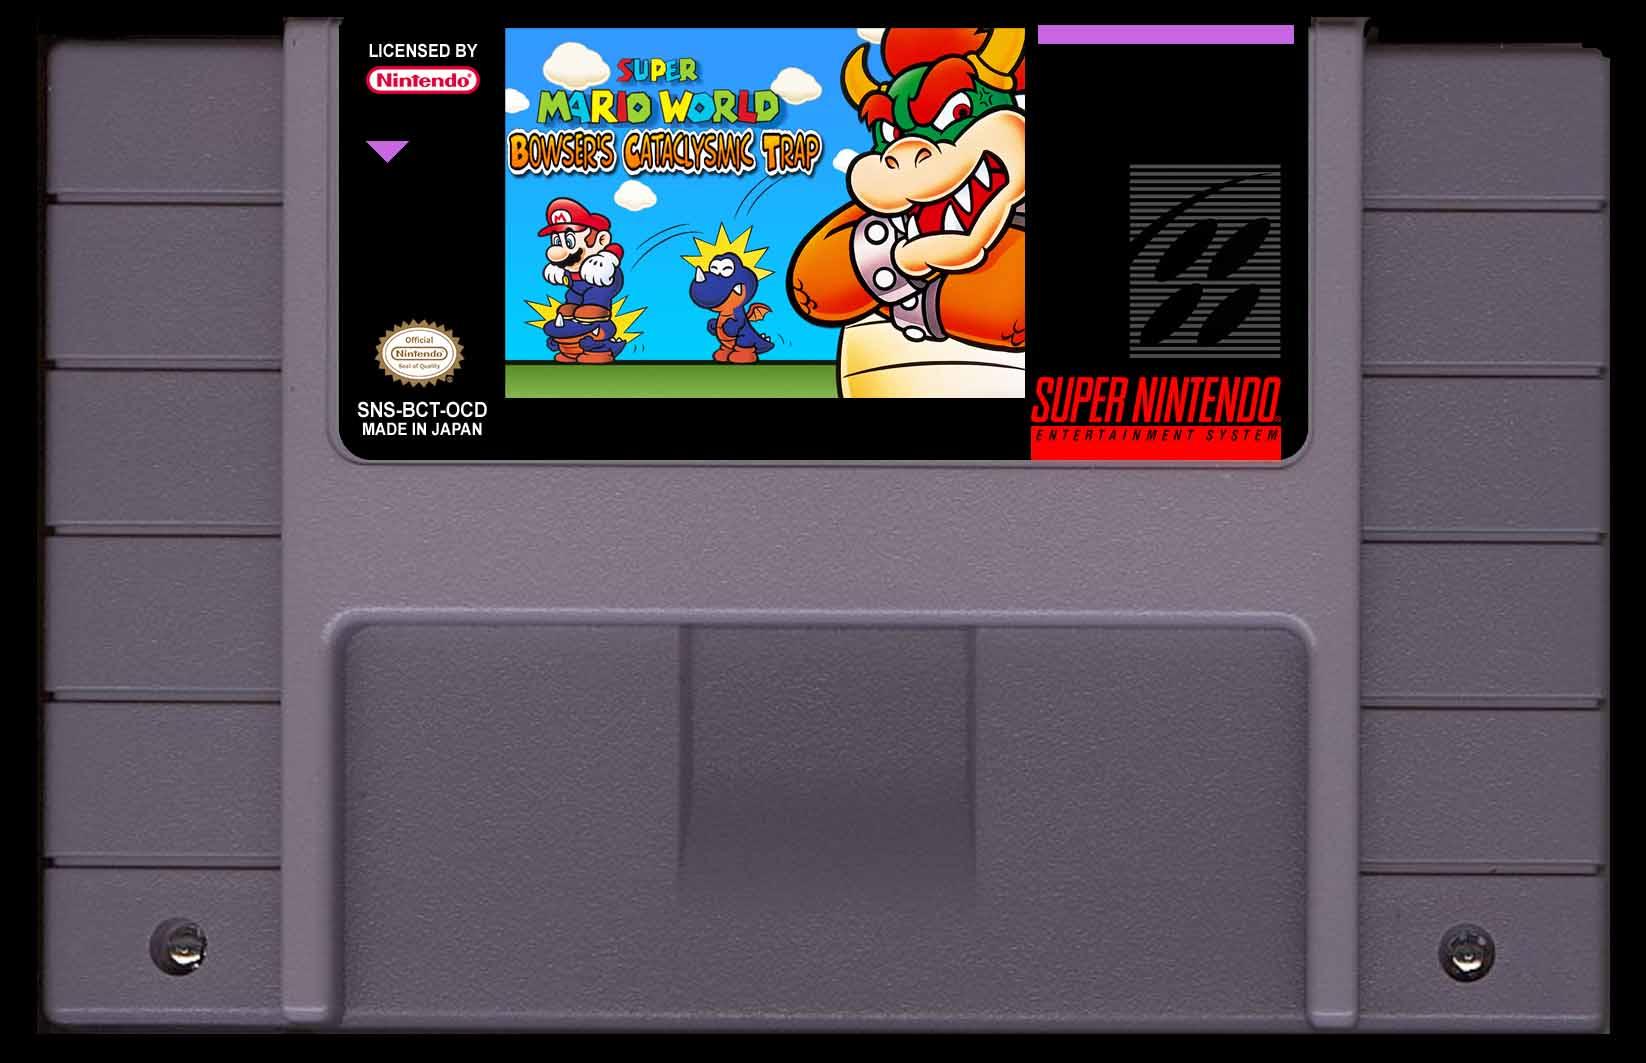 Super Mario World Bowser's Cataclysmic Trap